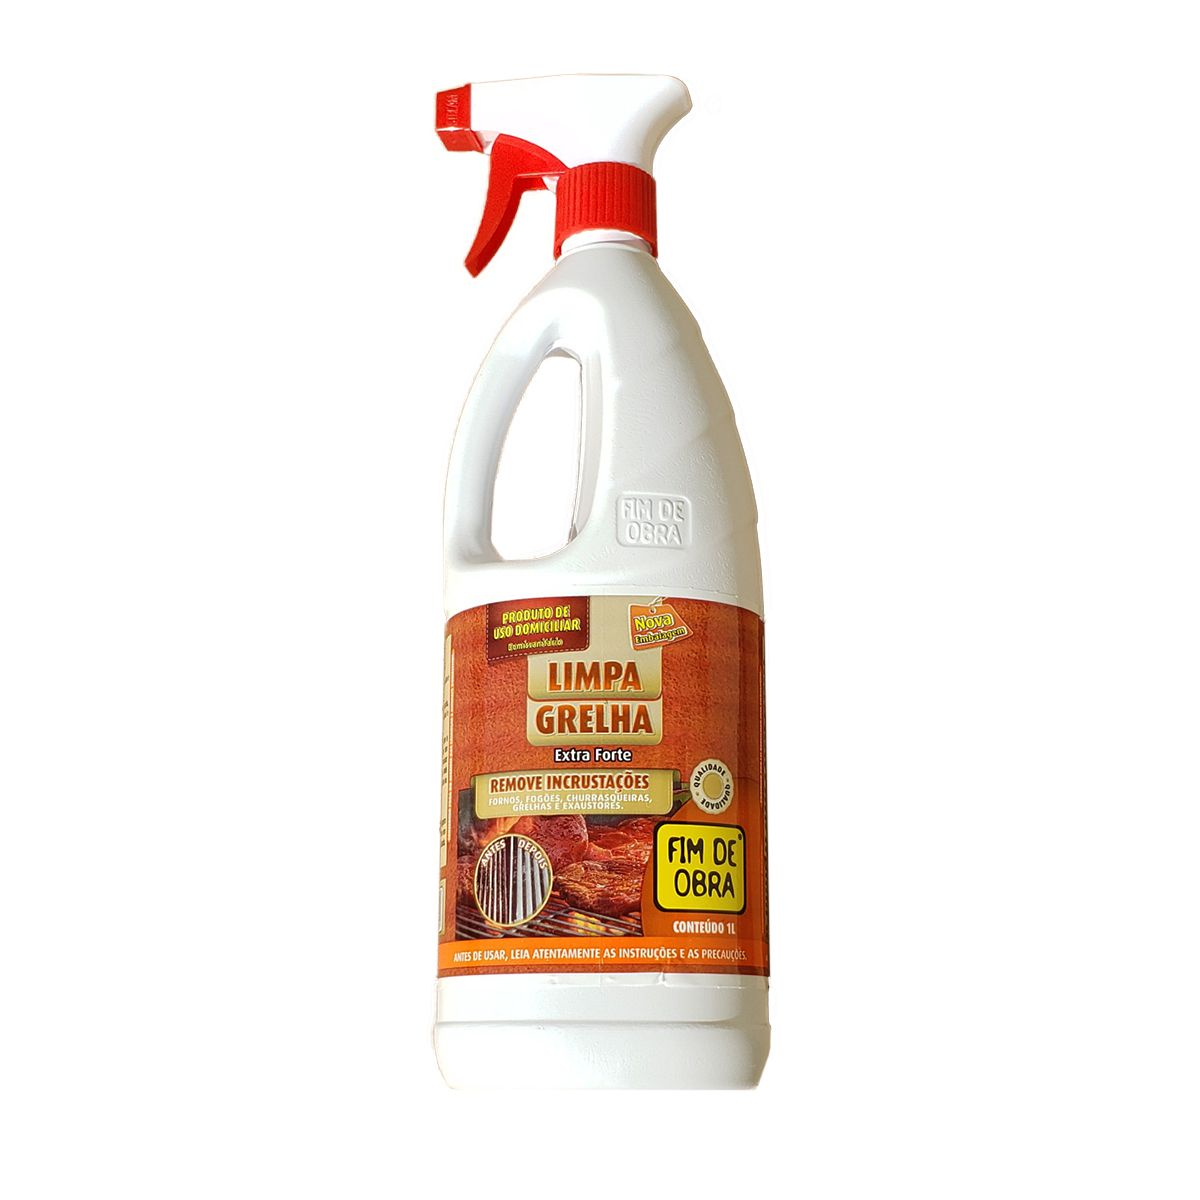 Limpa Grelha Borrifador 1 litro